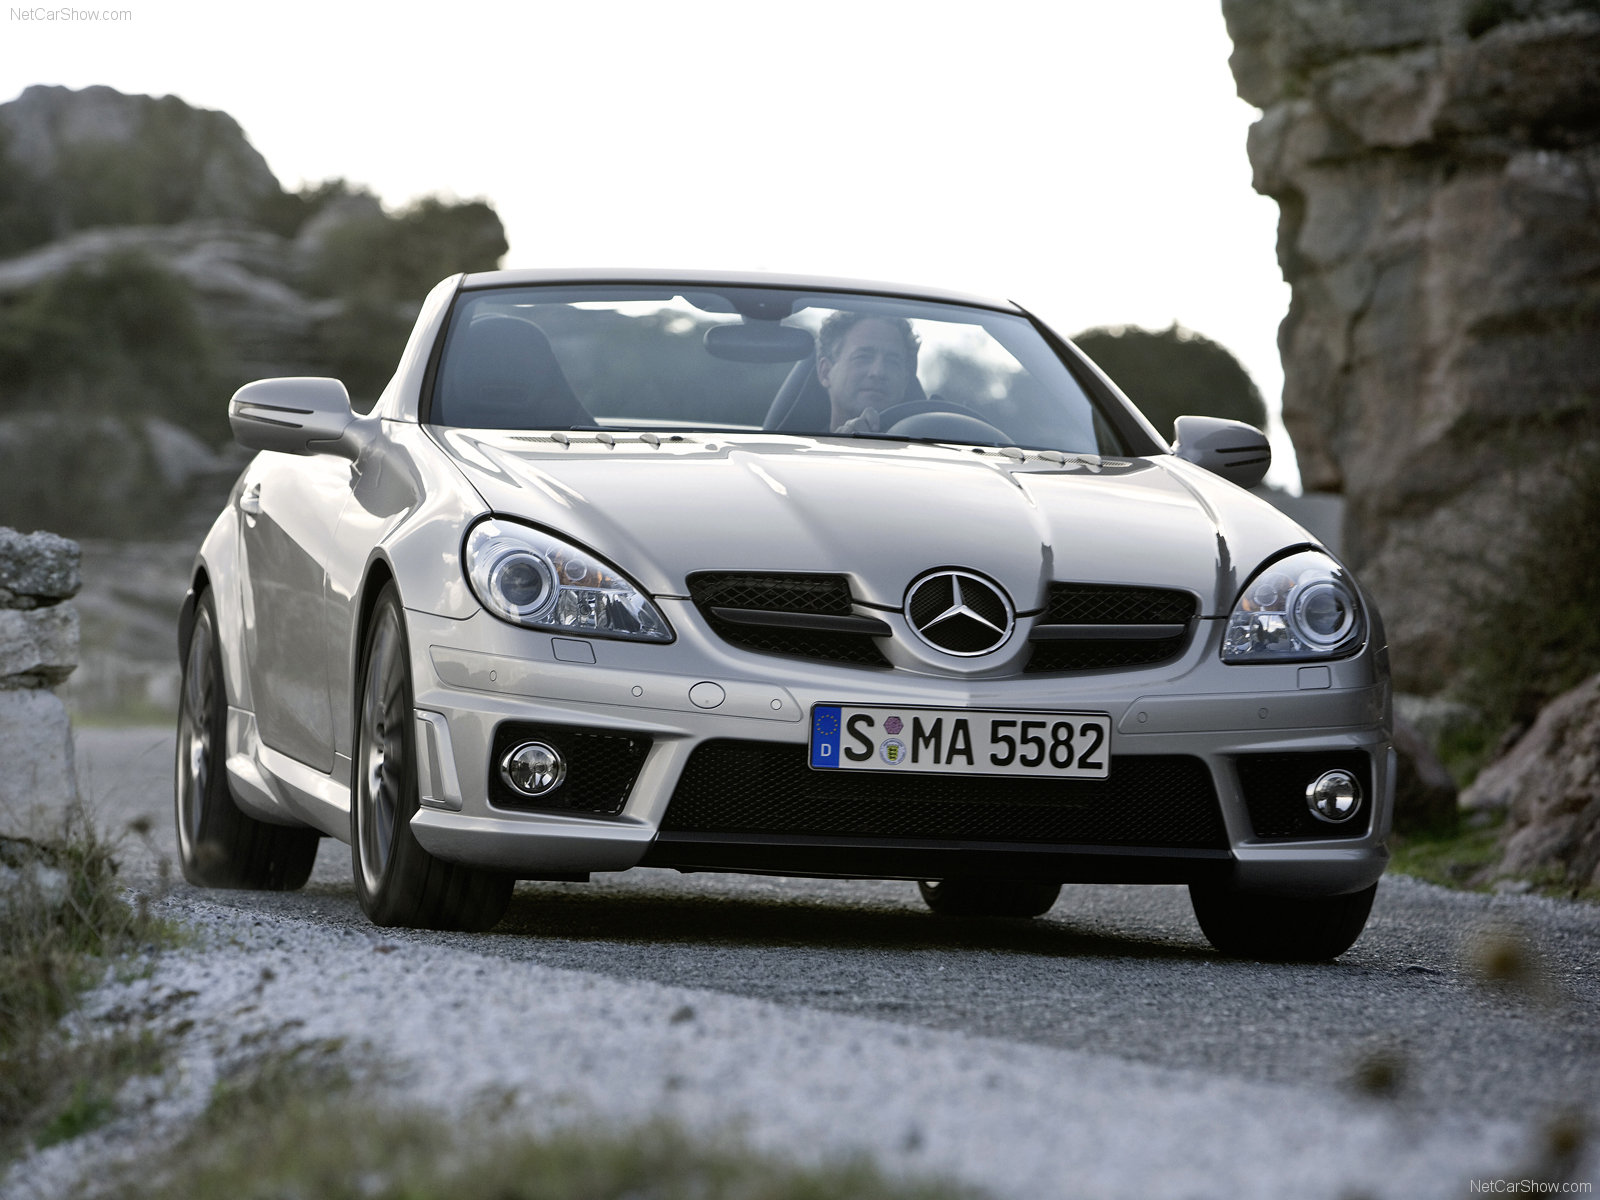 http://4.bp.blogspot.com/_cLWqMZQ1CPk/TUFtzJrTUaI/AAAAAAAAG0c/YljWo26OBqM/s1600/Mercedes-Benz-SLK_55_AMG_2008_1600x1200_wallpaper_01.jpg